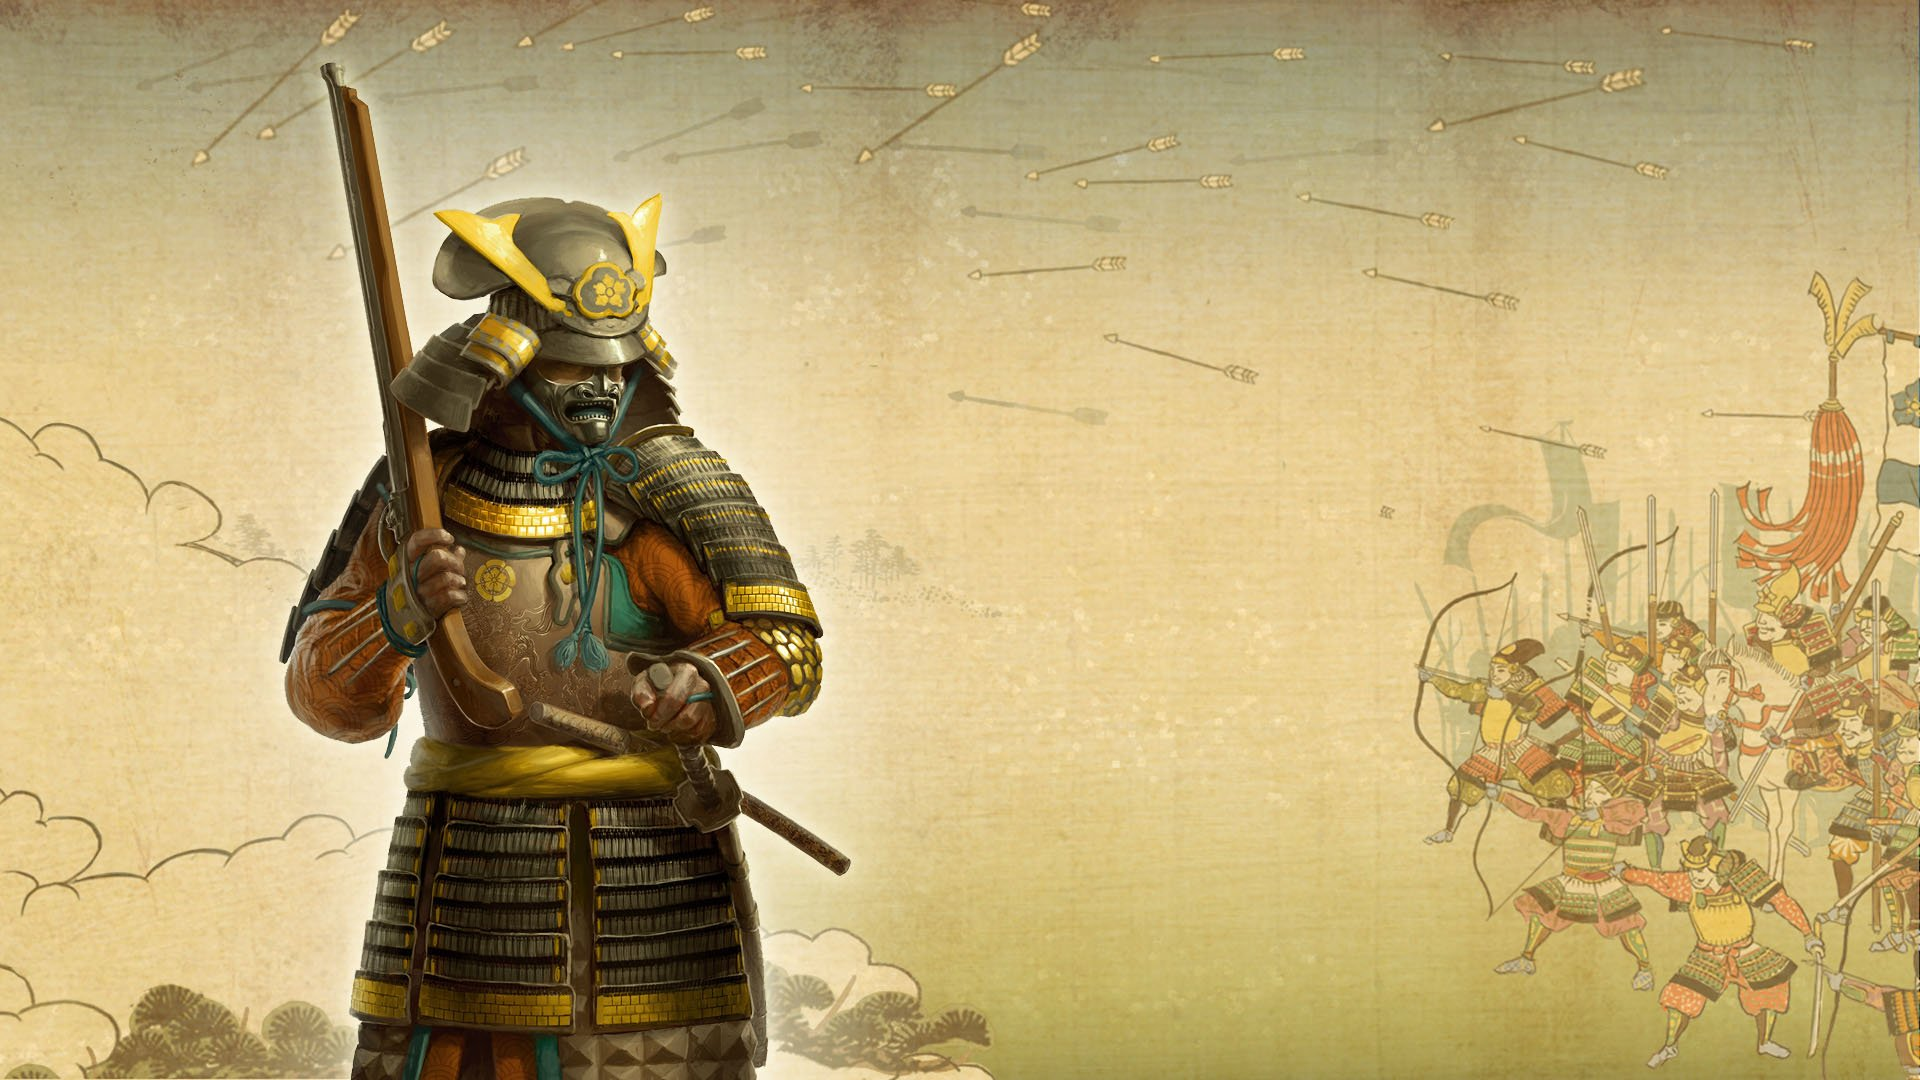 Total War Shogun wallpaper Game wallpapers